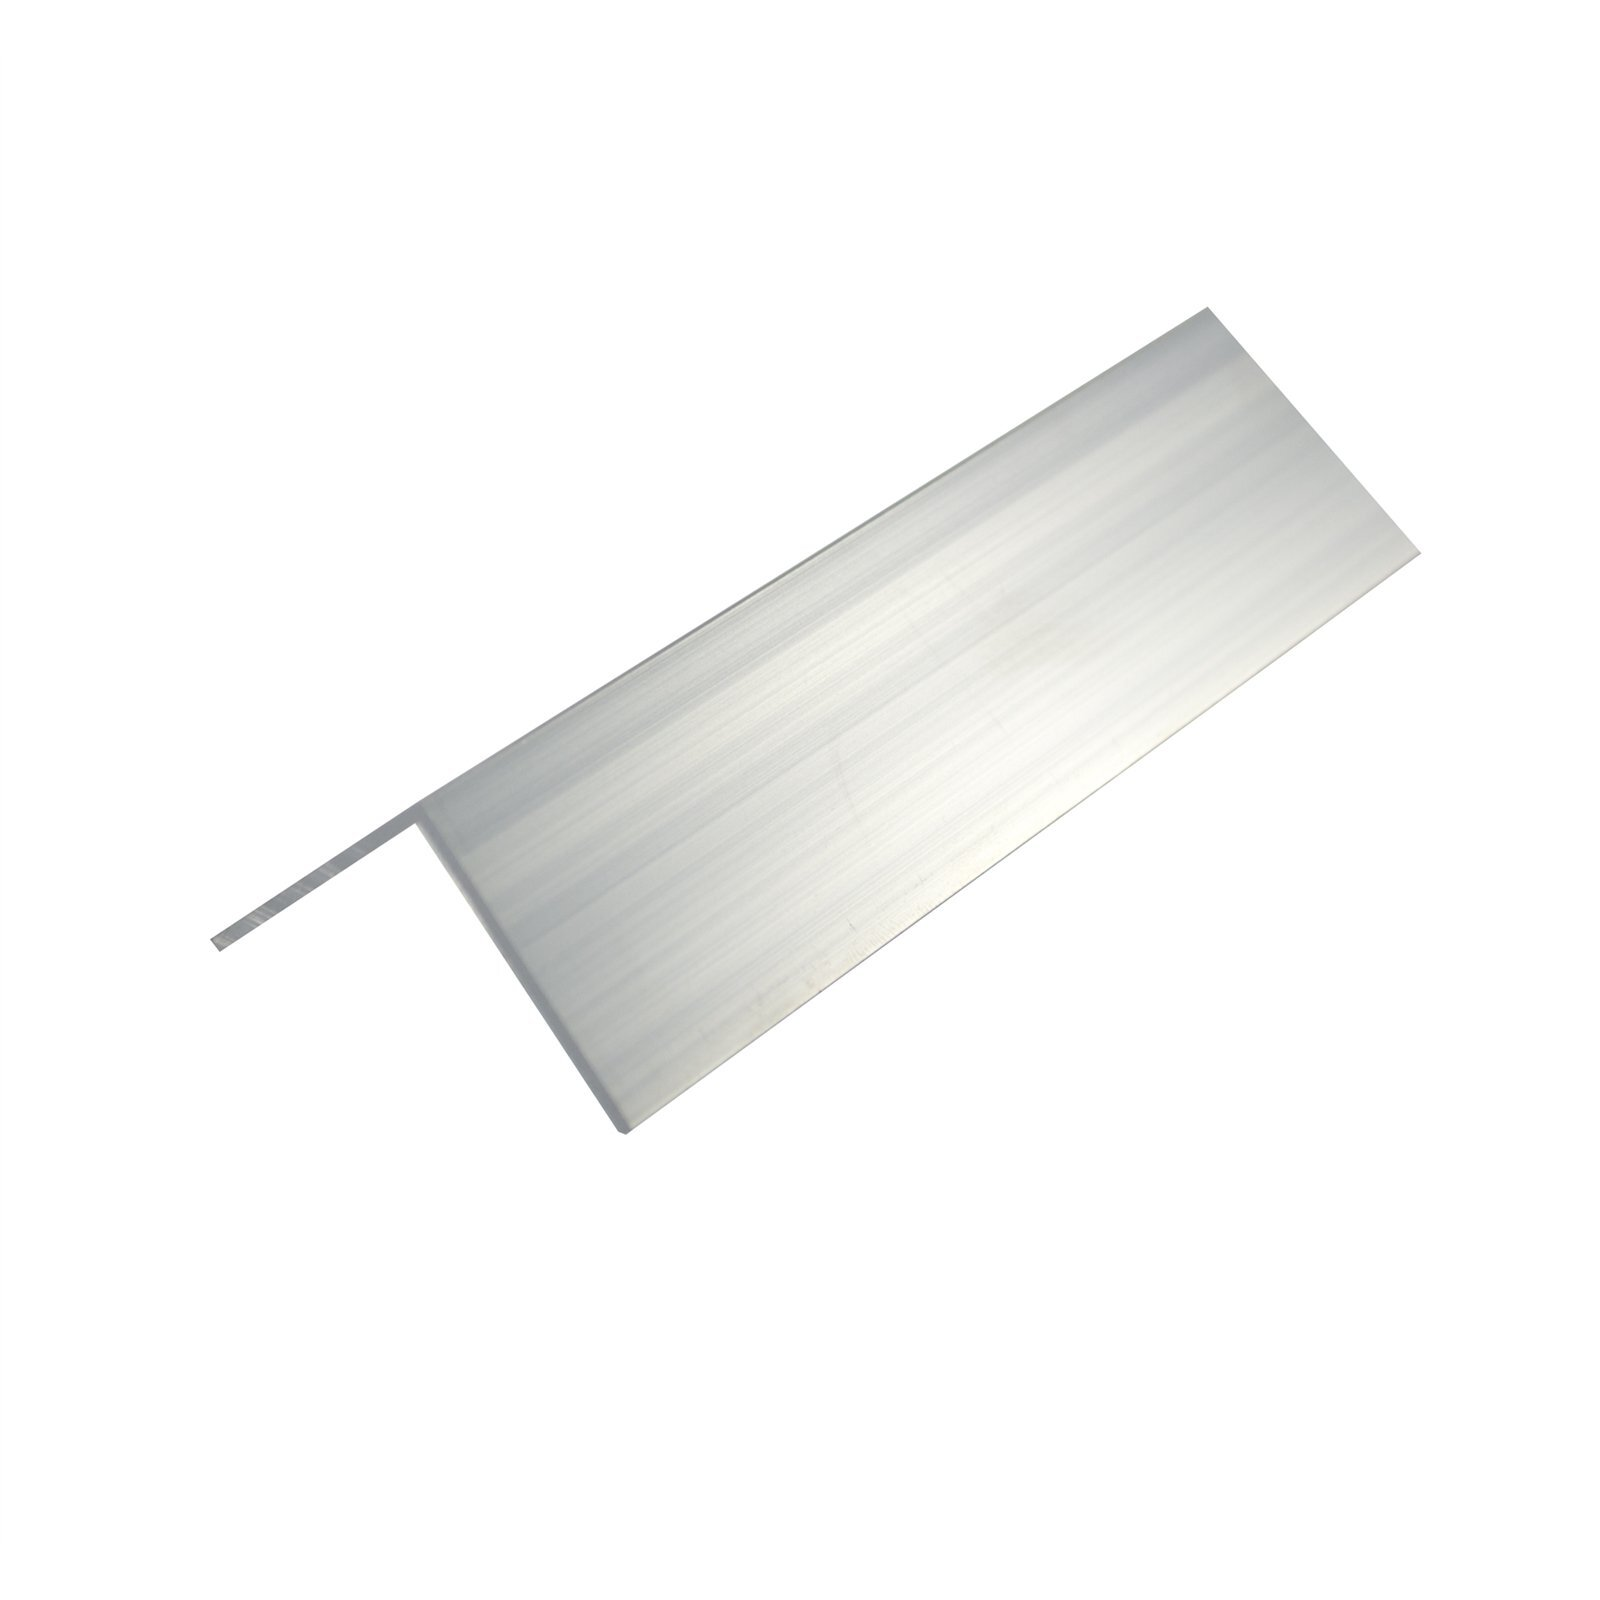 Metal Mate 12 x 12 x 3mm 1m Aluminium Equal Angle